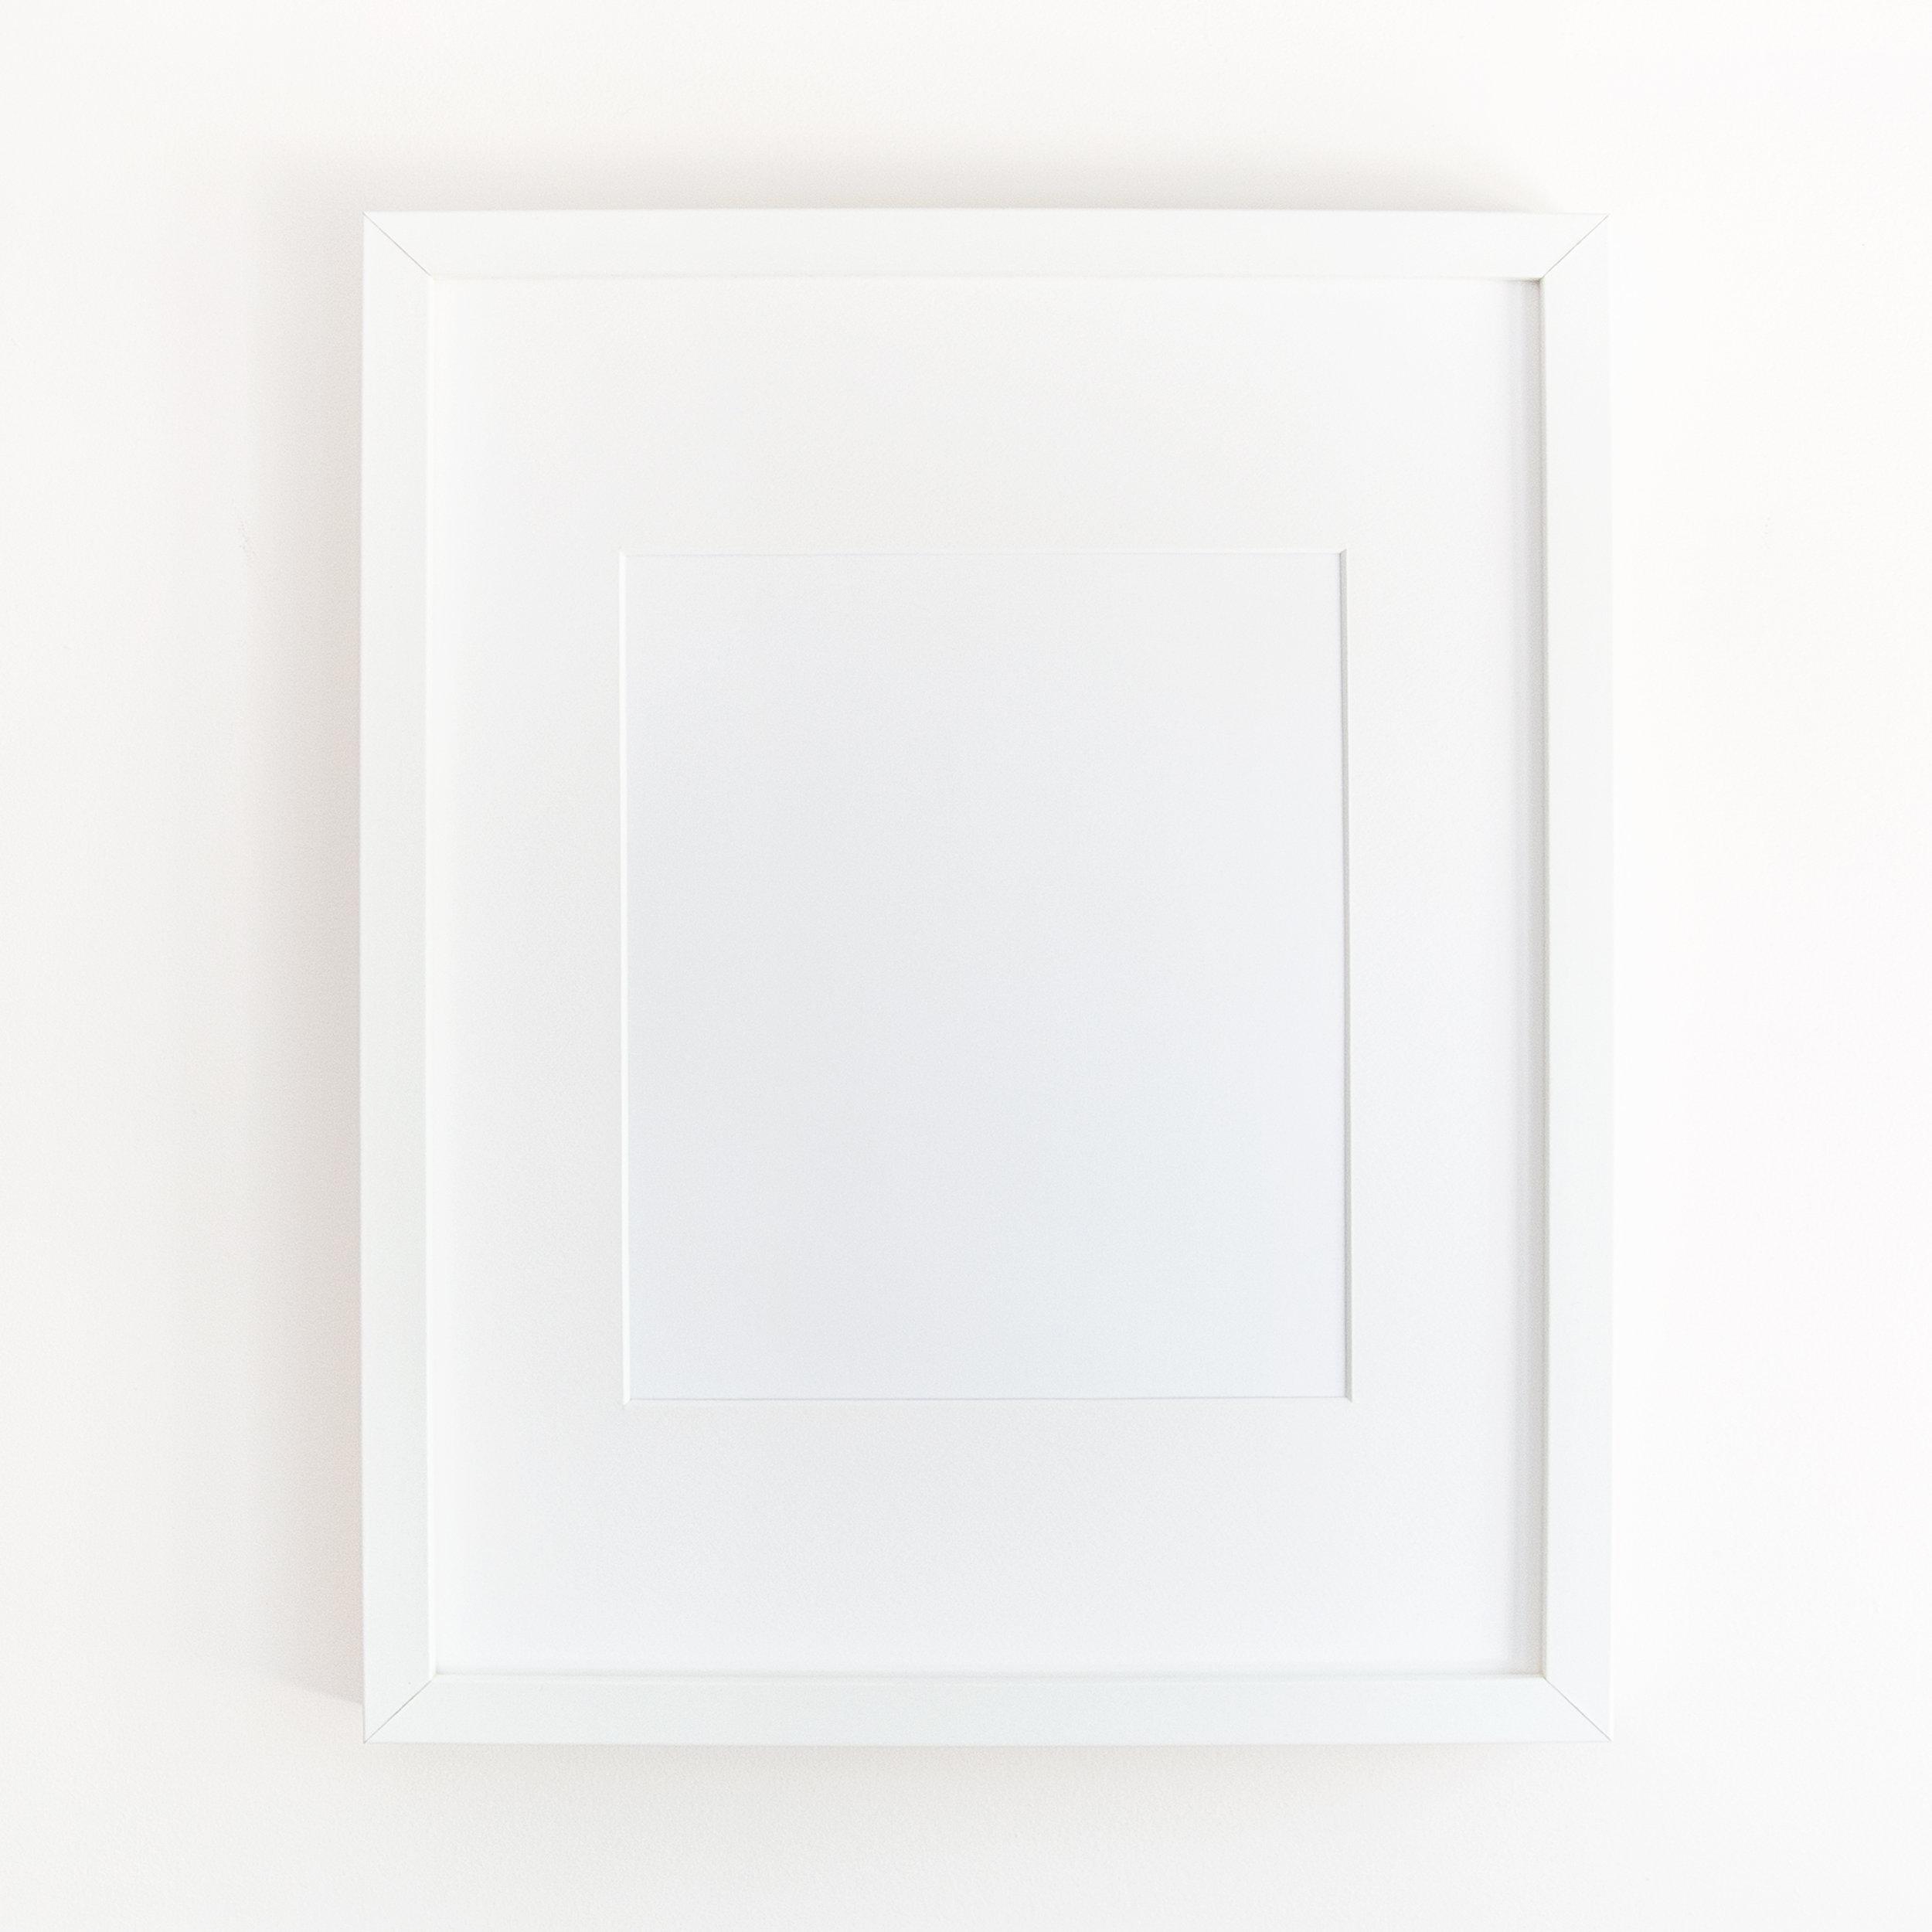 Blank Frame Photo